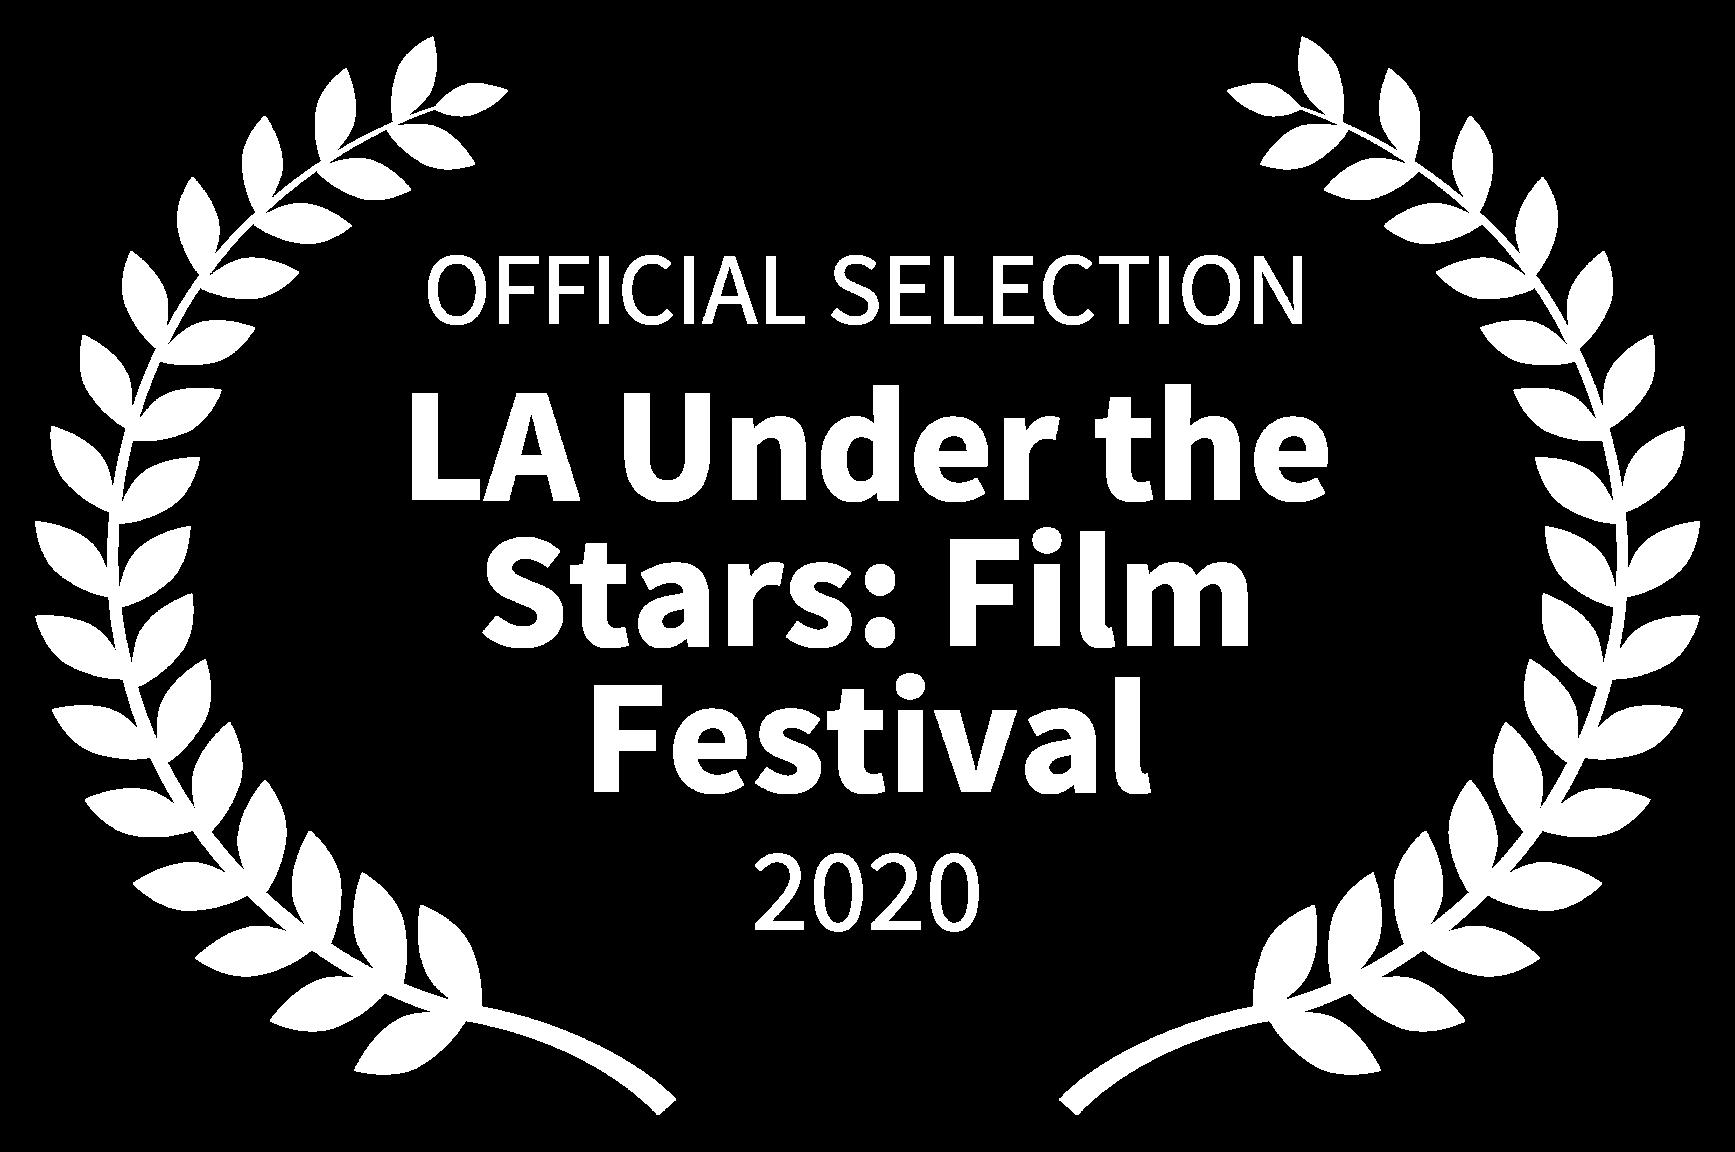 OFFICIAL-SELECTION-LA-Under-the-Stars-Film-Festival-2020-WHITE-1